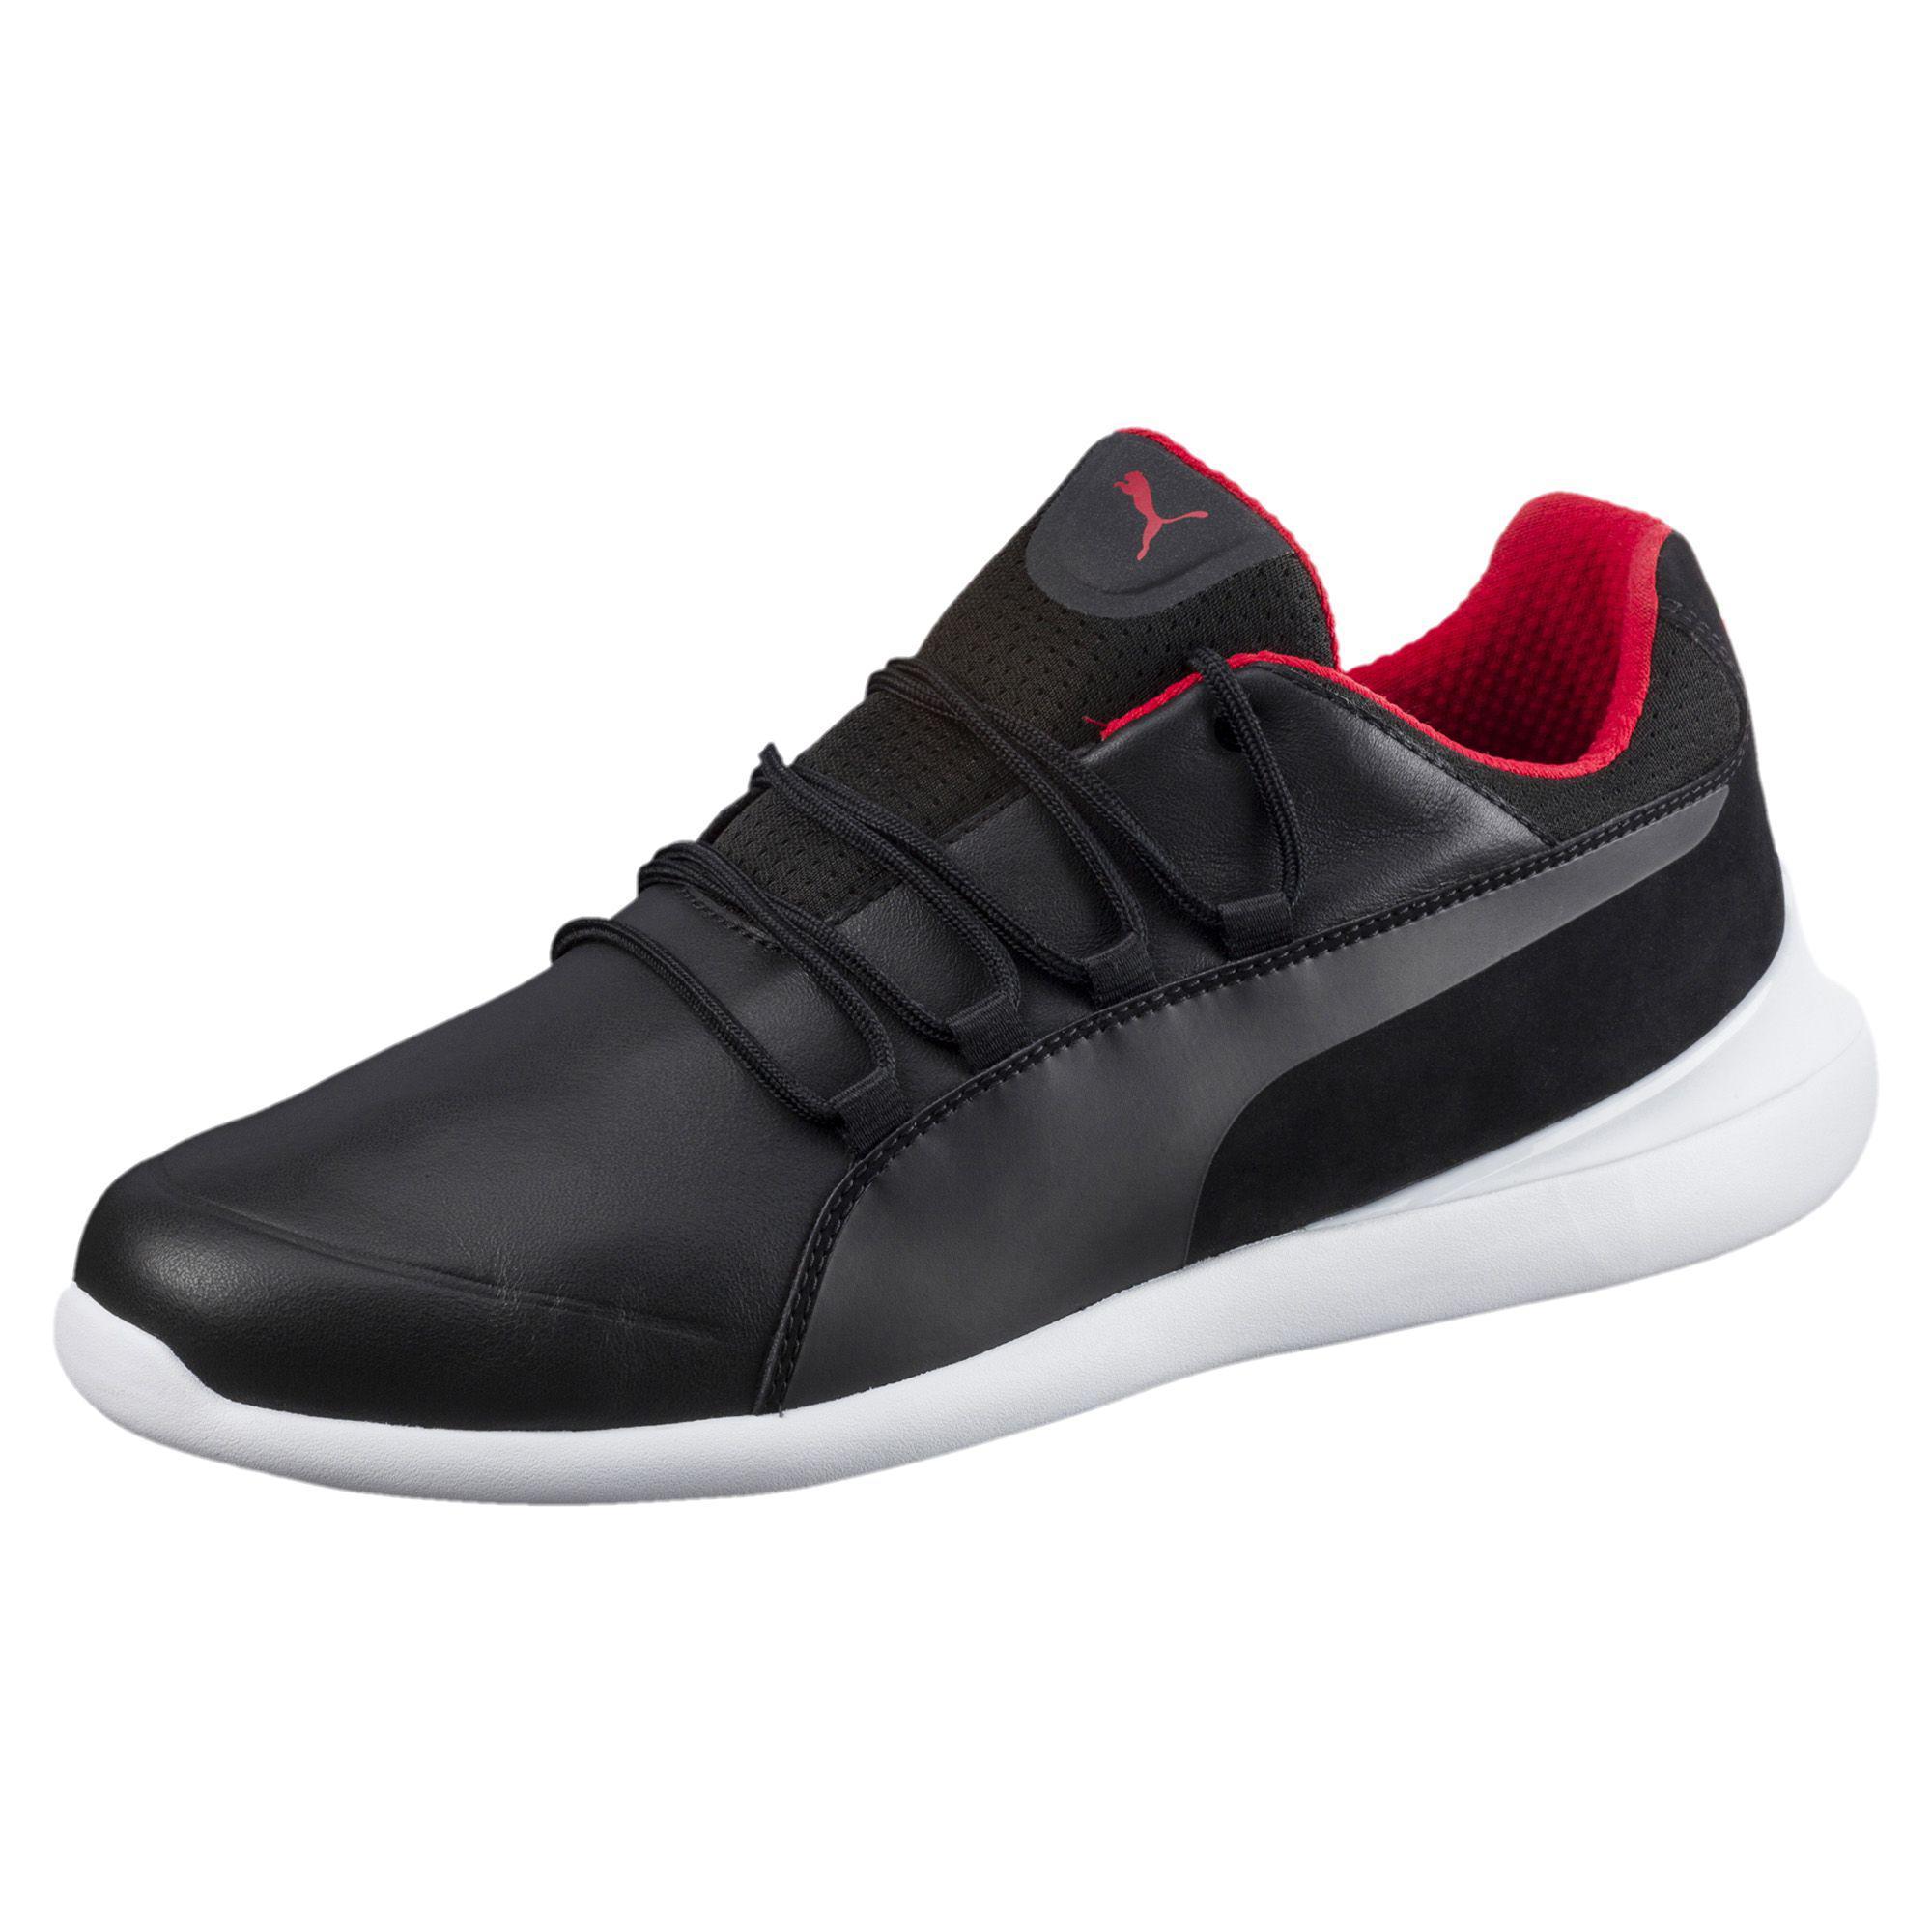 Baskets Chat Hommes Pumas Sf Evo, Noir Blanc Noir, 11,5 M